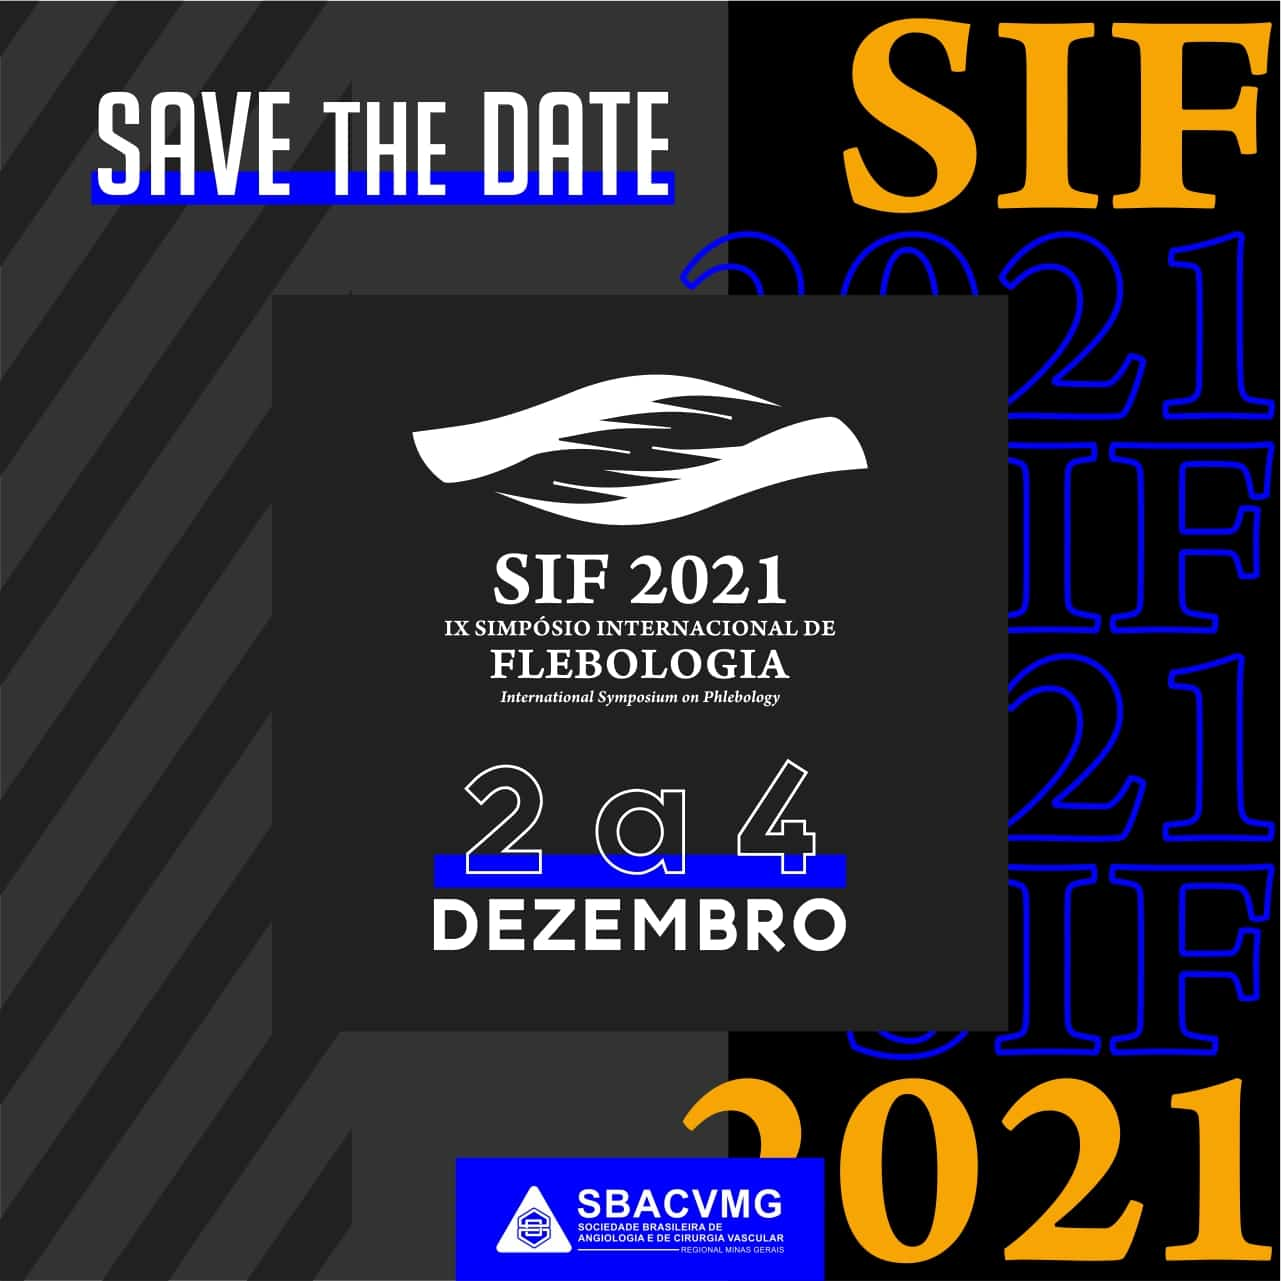 Sif 2021 _1280